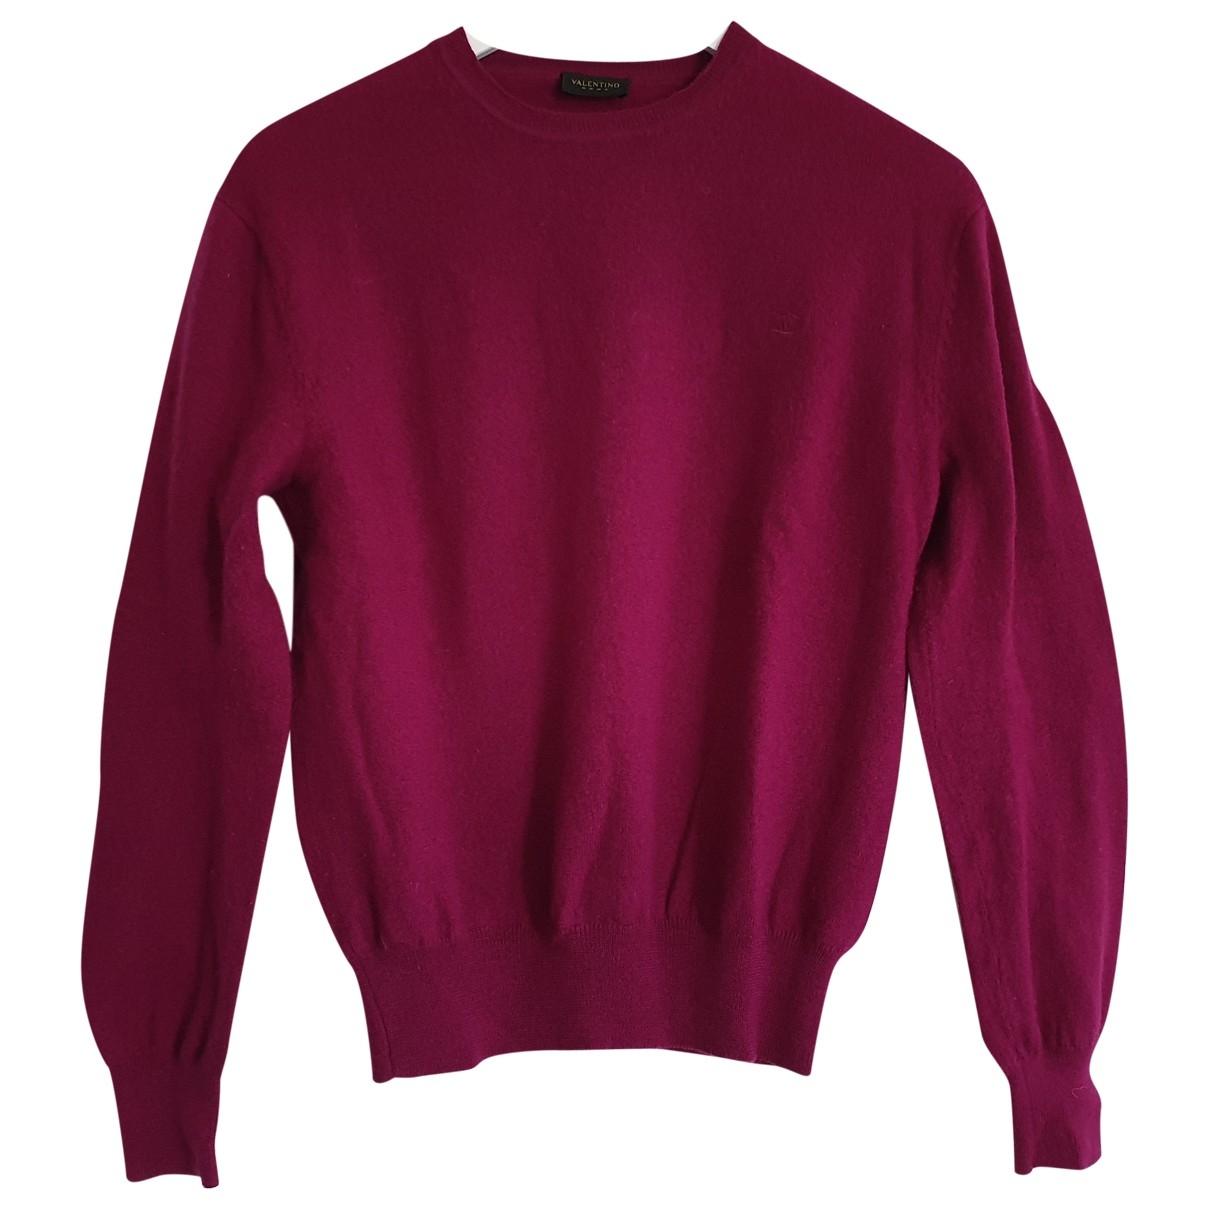 Valentino Garavani - Pull   pour femme en laine - rose